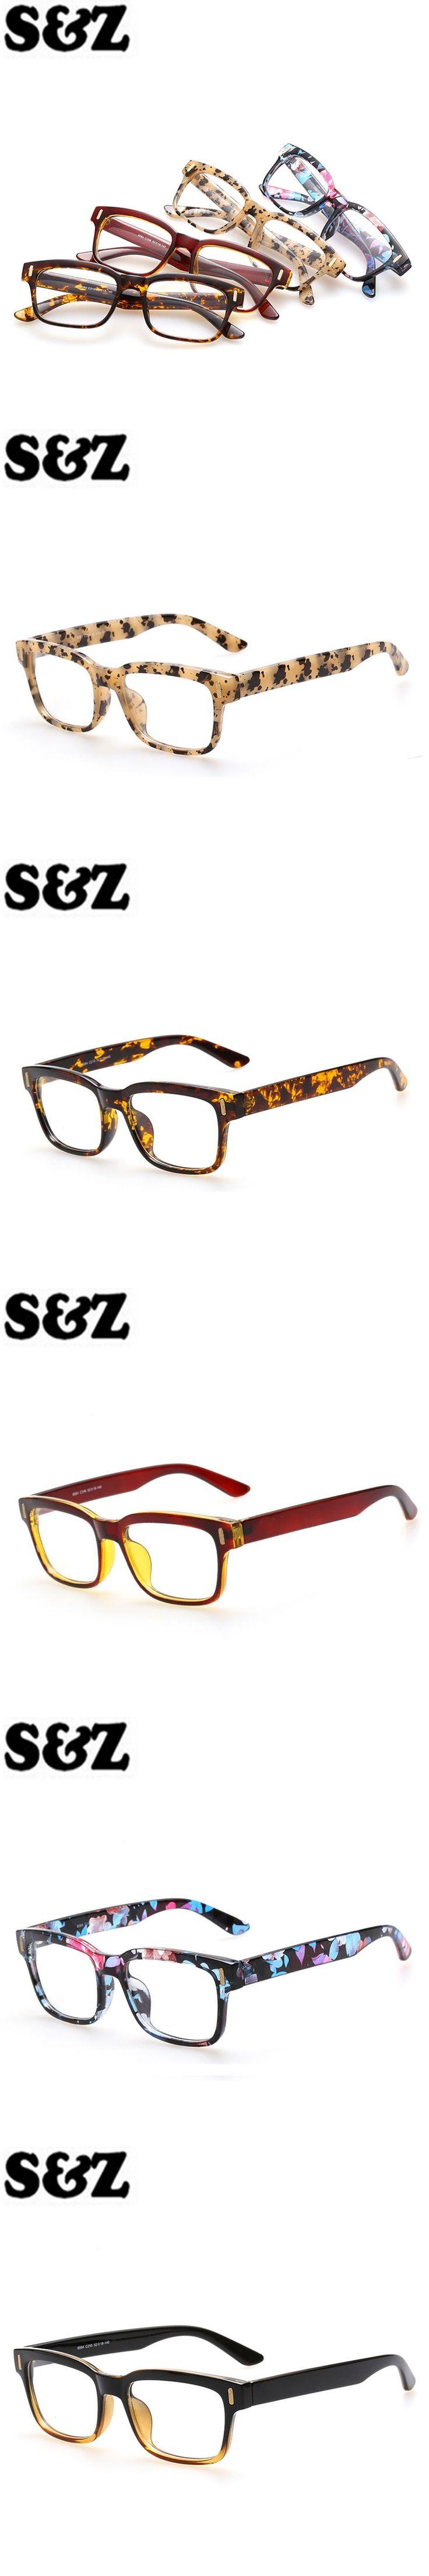 Optical Eyewear Frame for Men Women Glasses Frames Clear Fake Glasses Square Eye glasses Mirror Retro Fashion Eyewear Frame